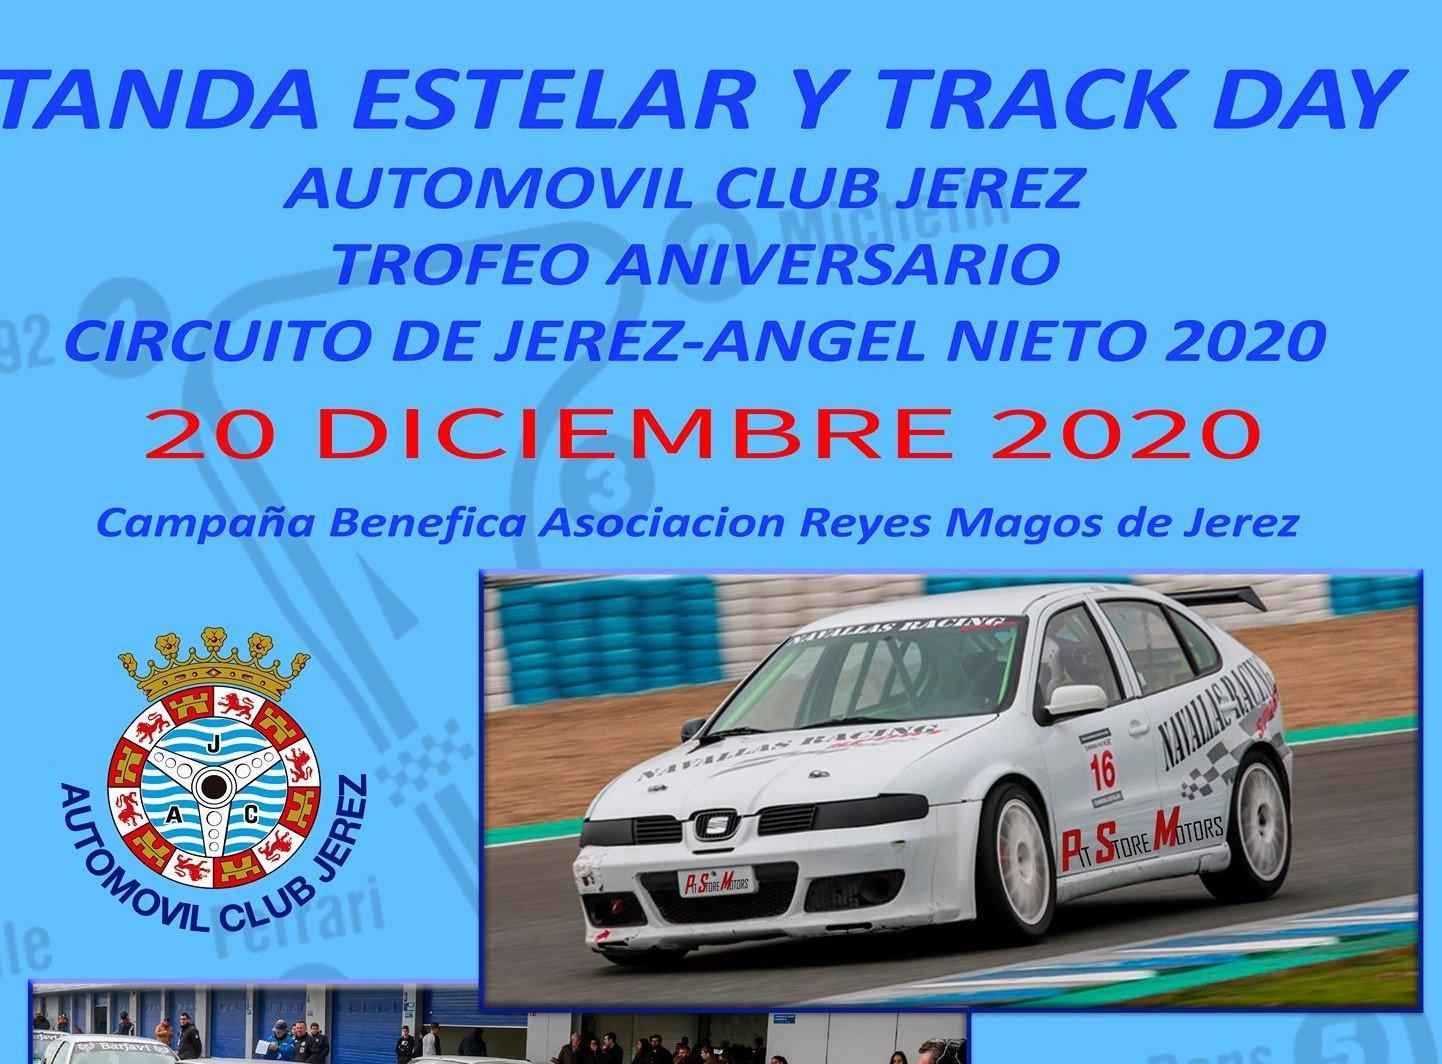 Trofeo Aniversario Circuito de Jerez